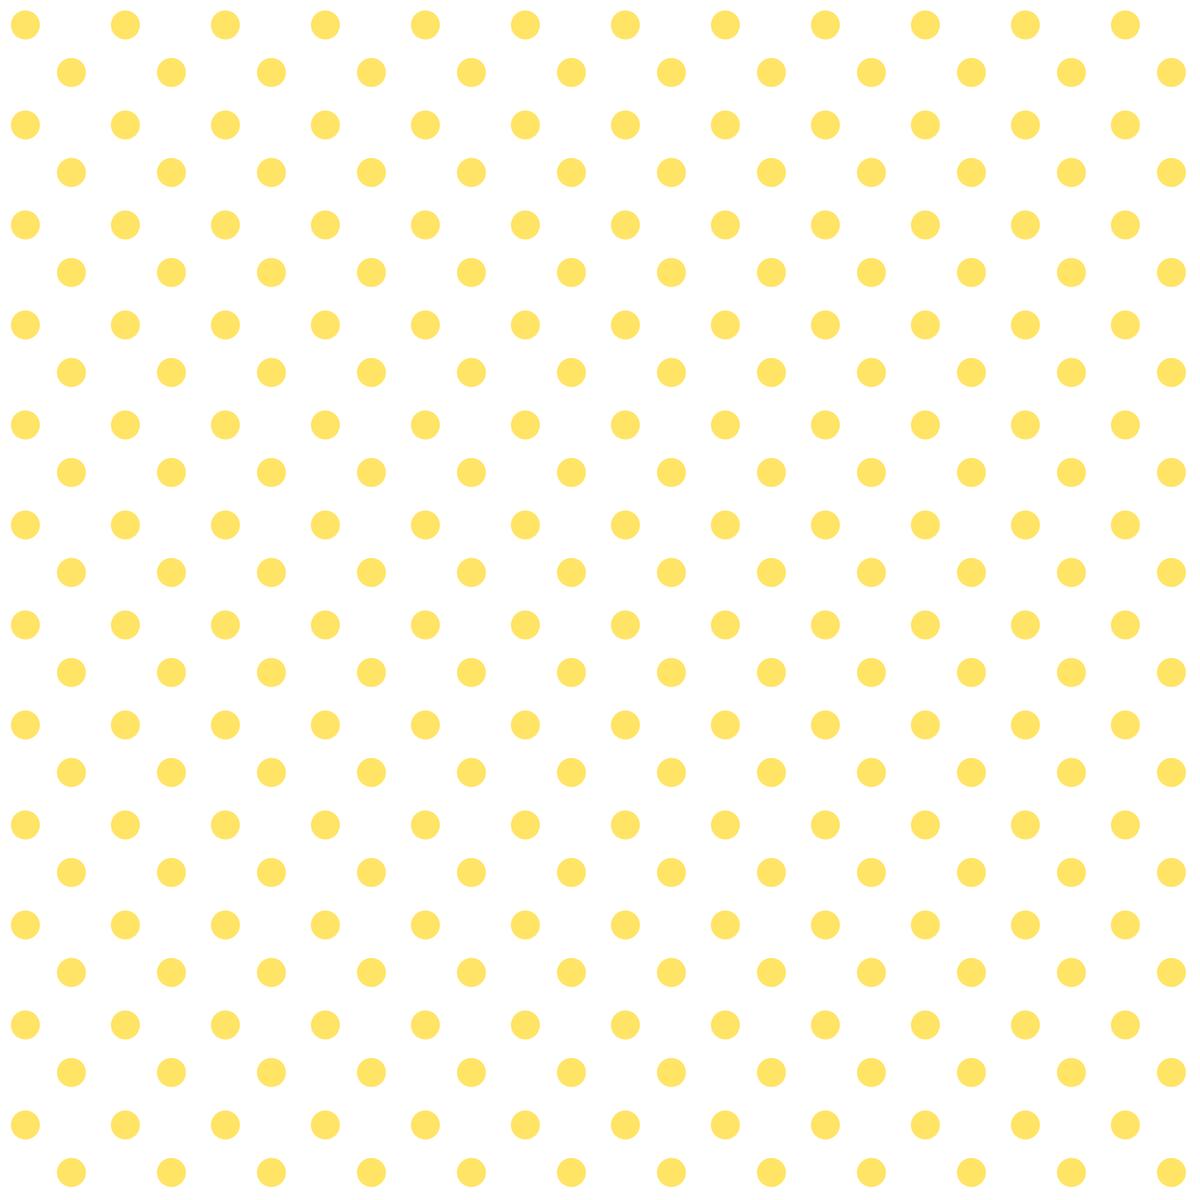 Free Polka Dot Background PNG - 153100